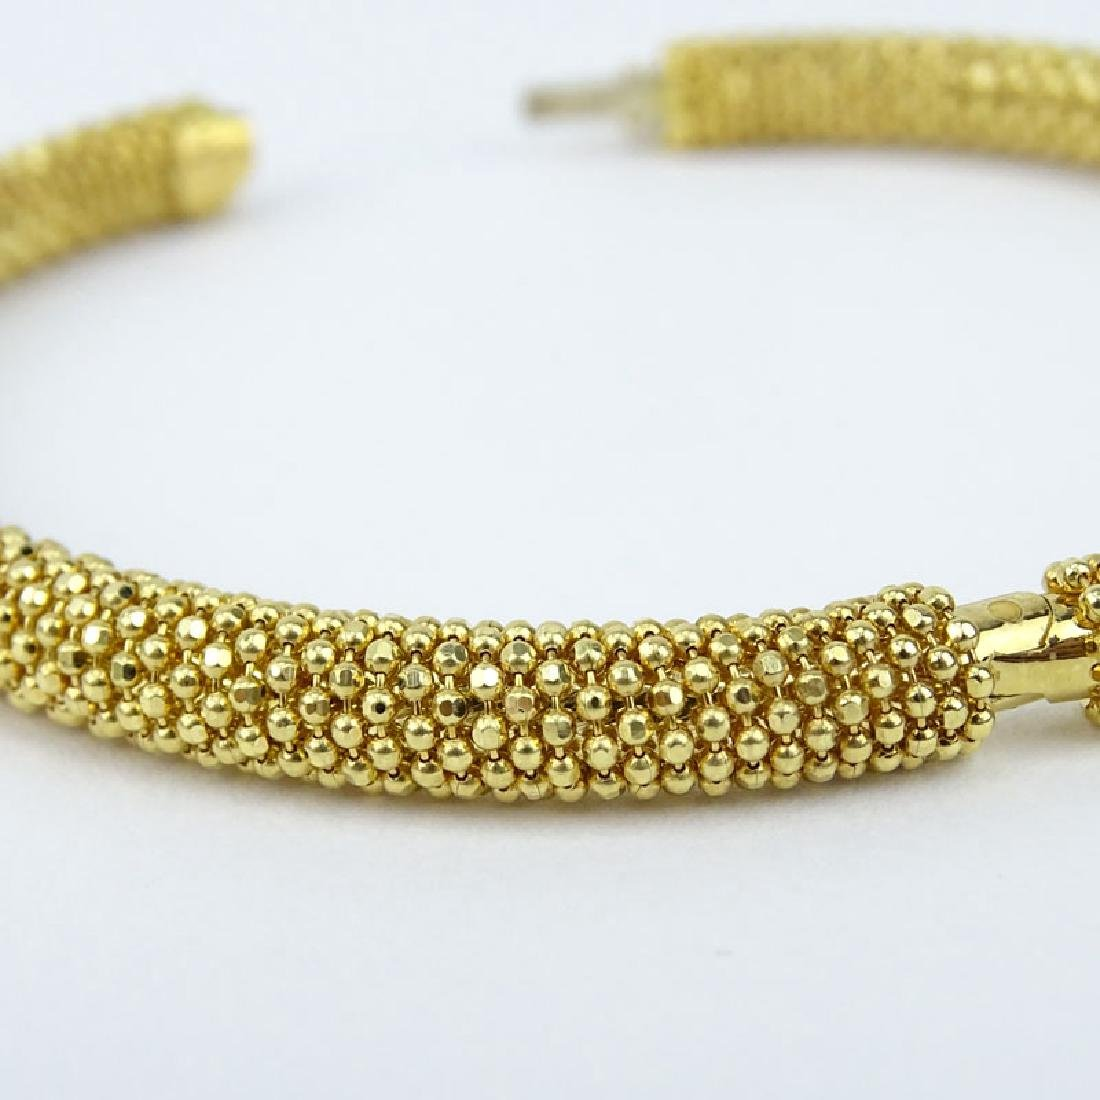 Vintage Italian 18 Karat Yellow Gold Beaded Hinged - 3